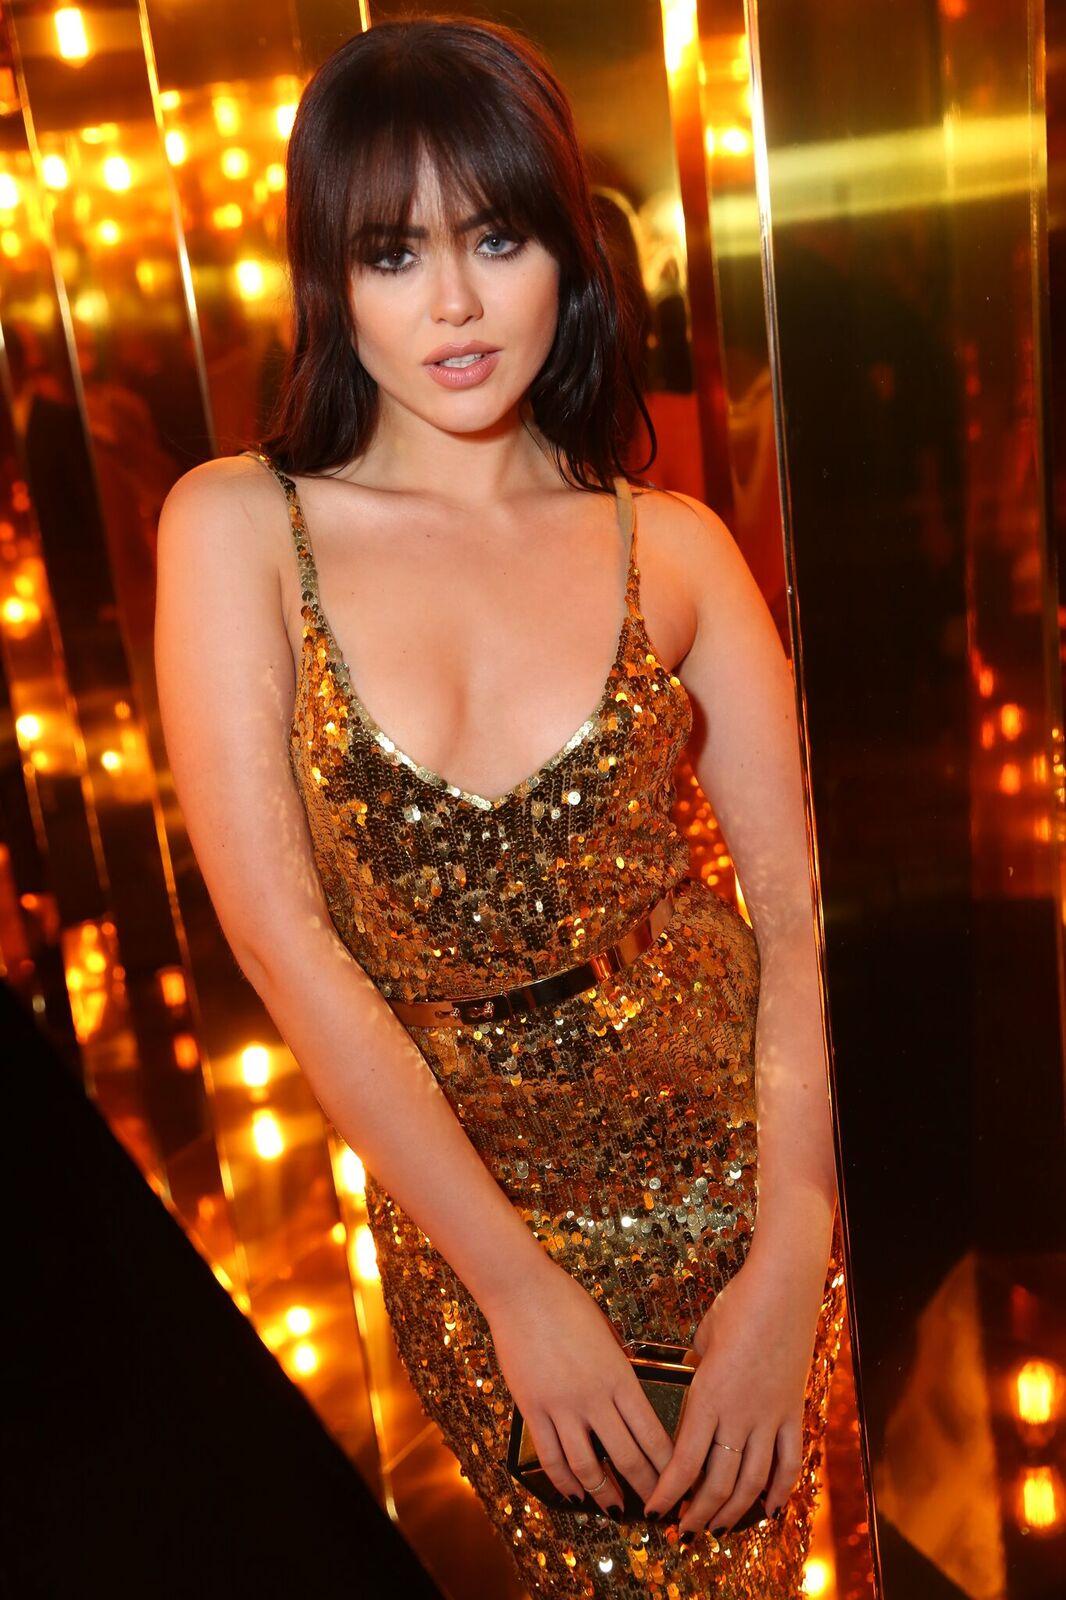 Kristina Bazan 224 La Soir 233 E L Or 233 Al Gold Obsession Les